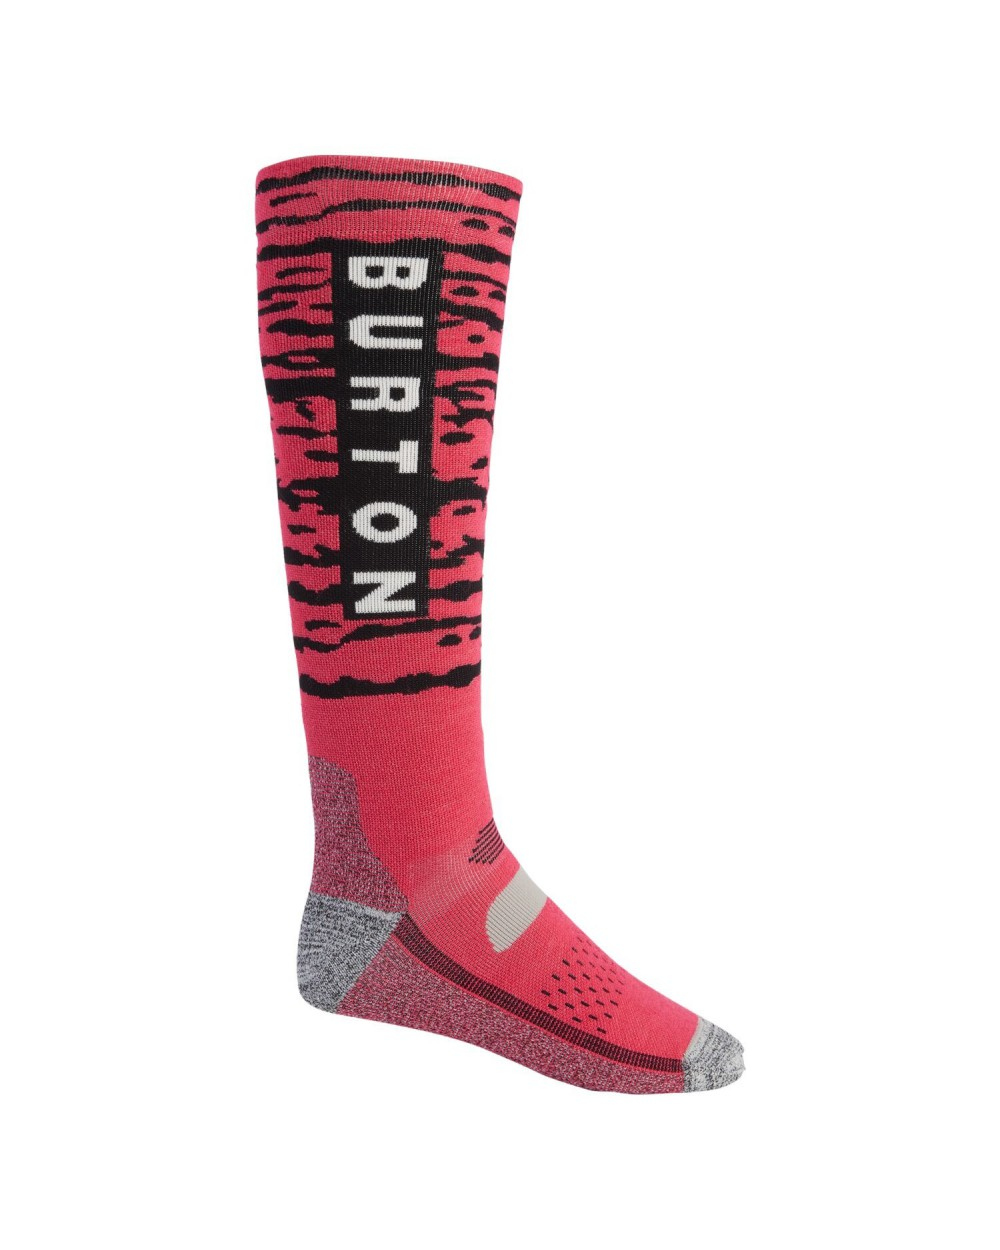 Burton Performance Midweight Snowboard Socks - Punchy Pink